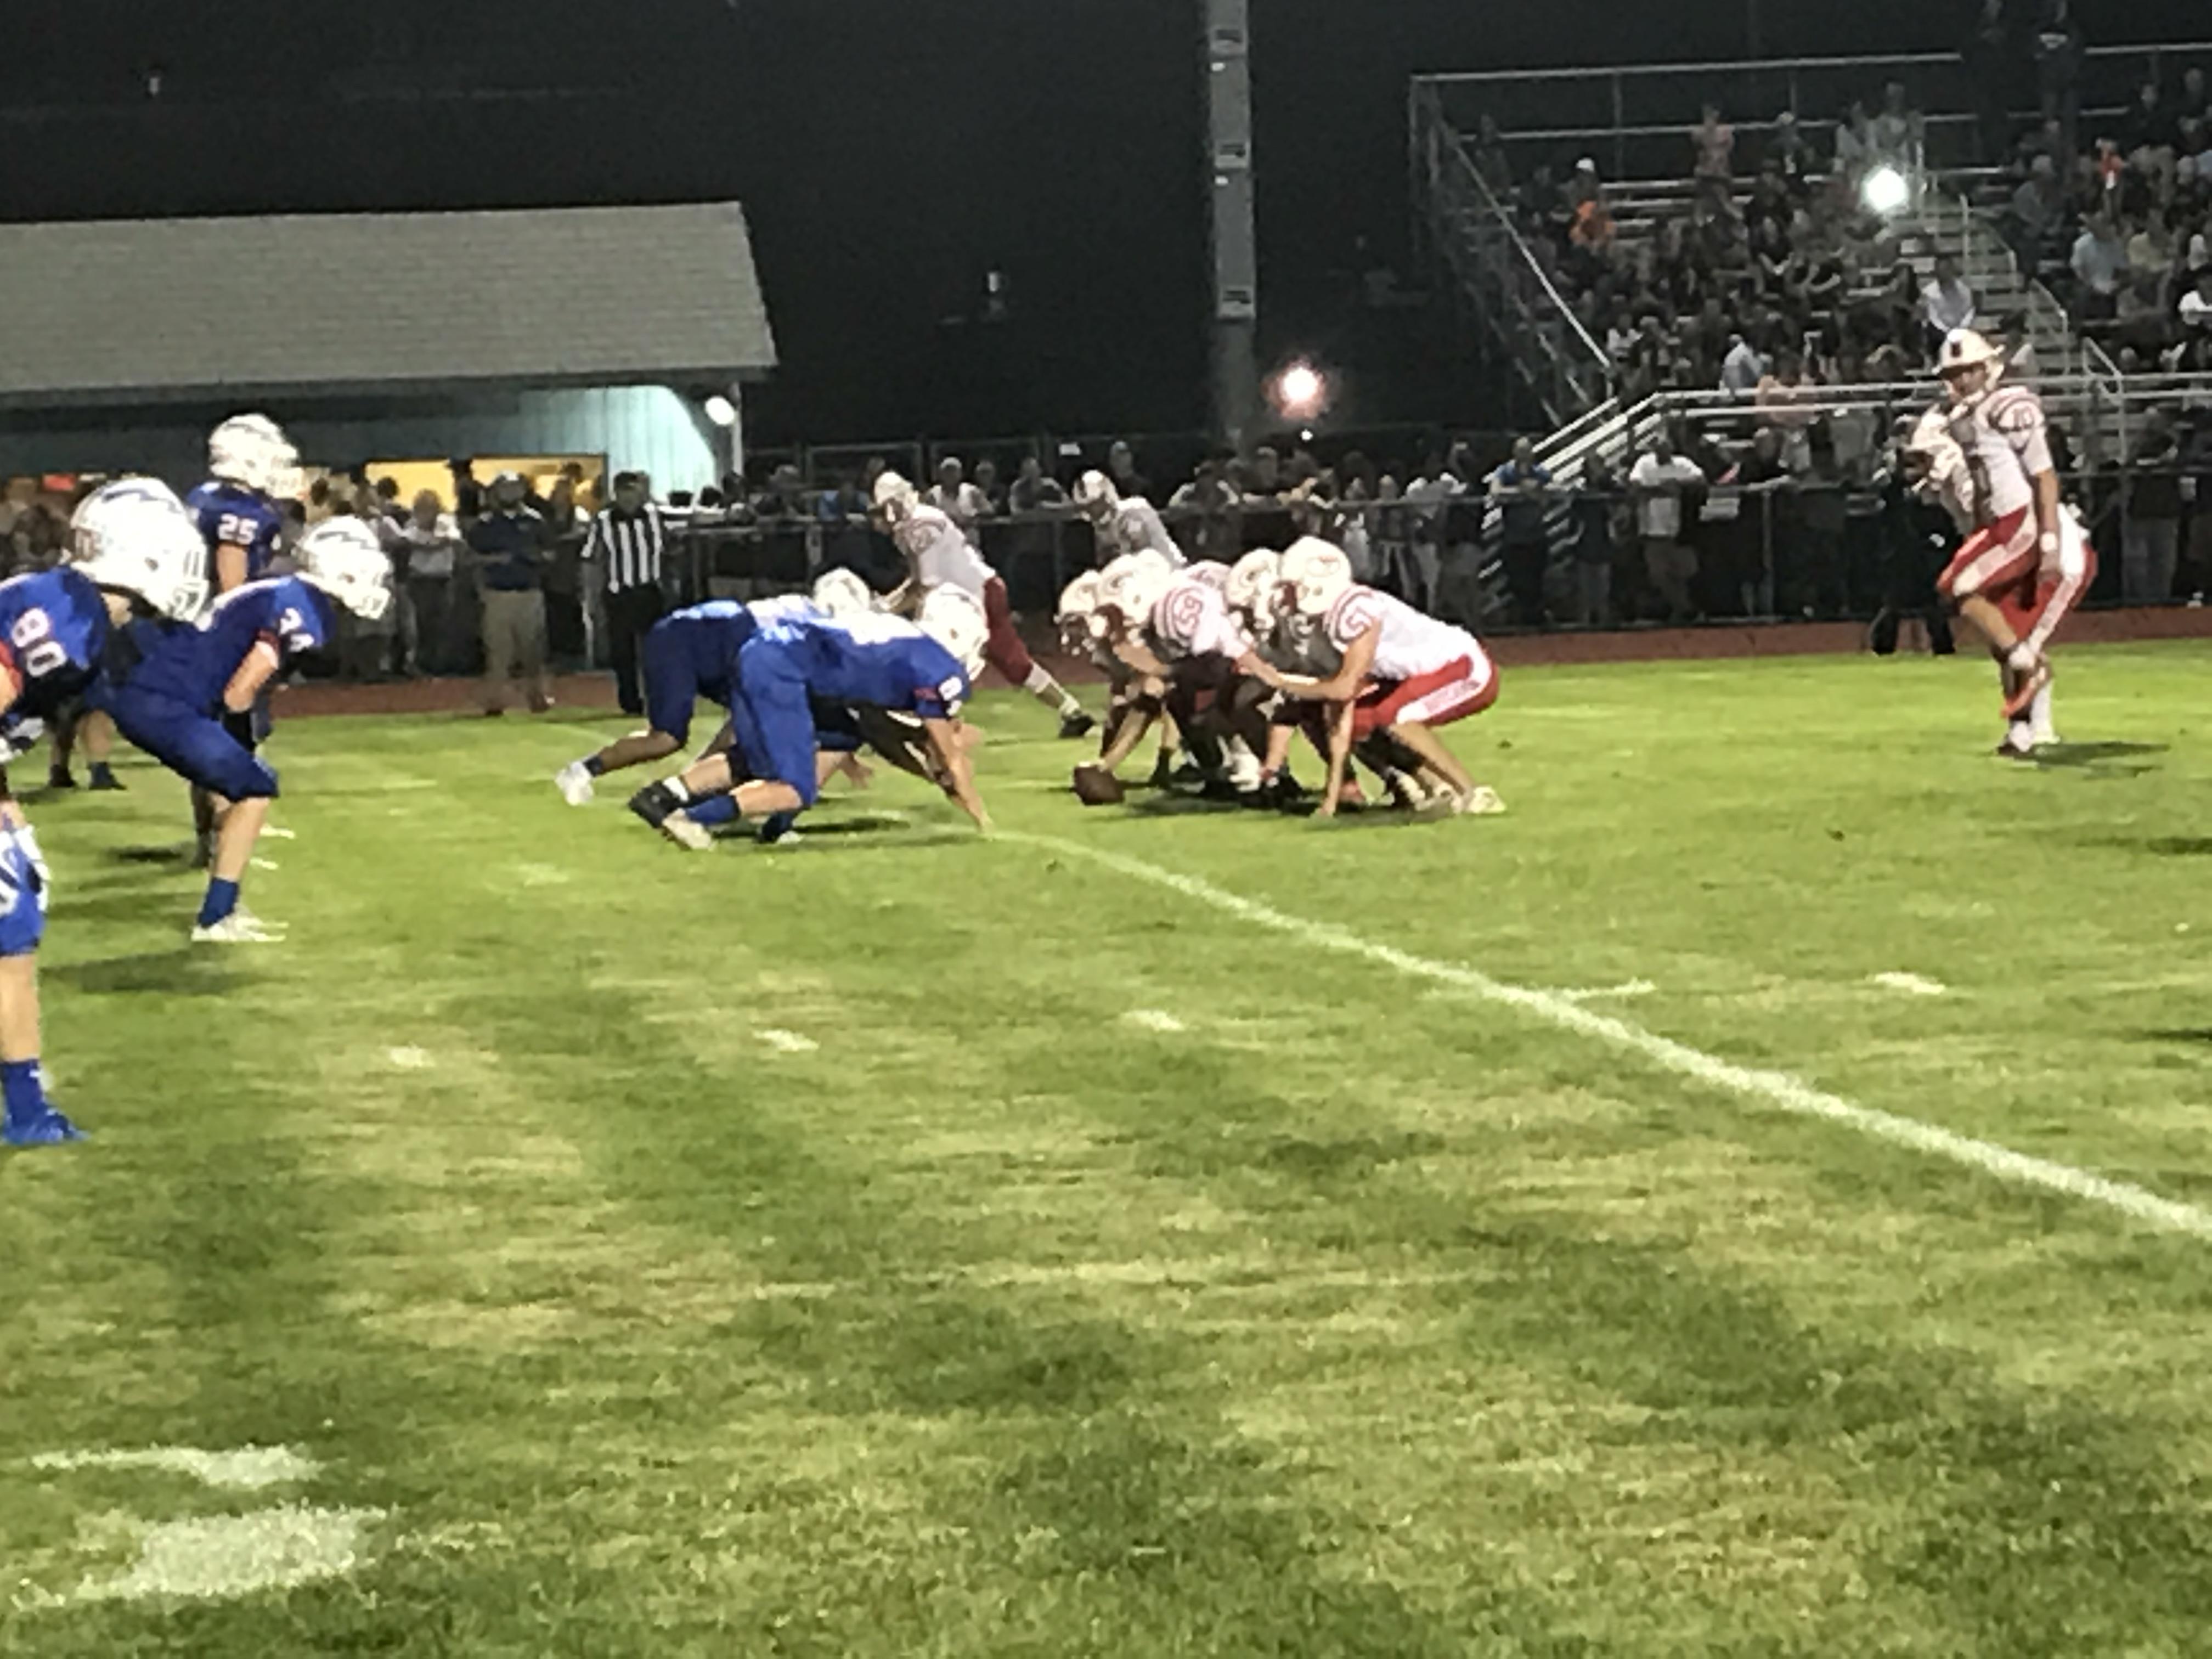 Football: Saratoga moves past Guilderland to keep undefeated season alive